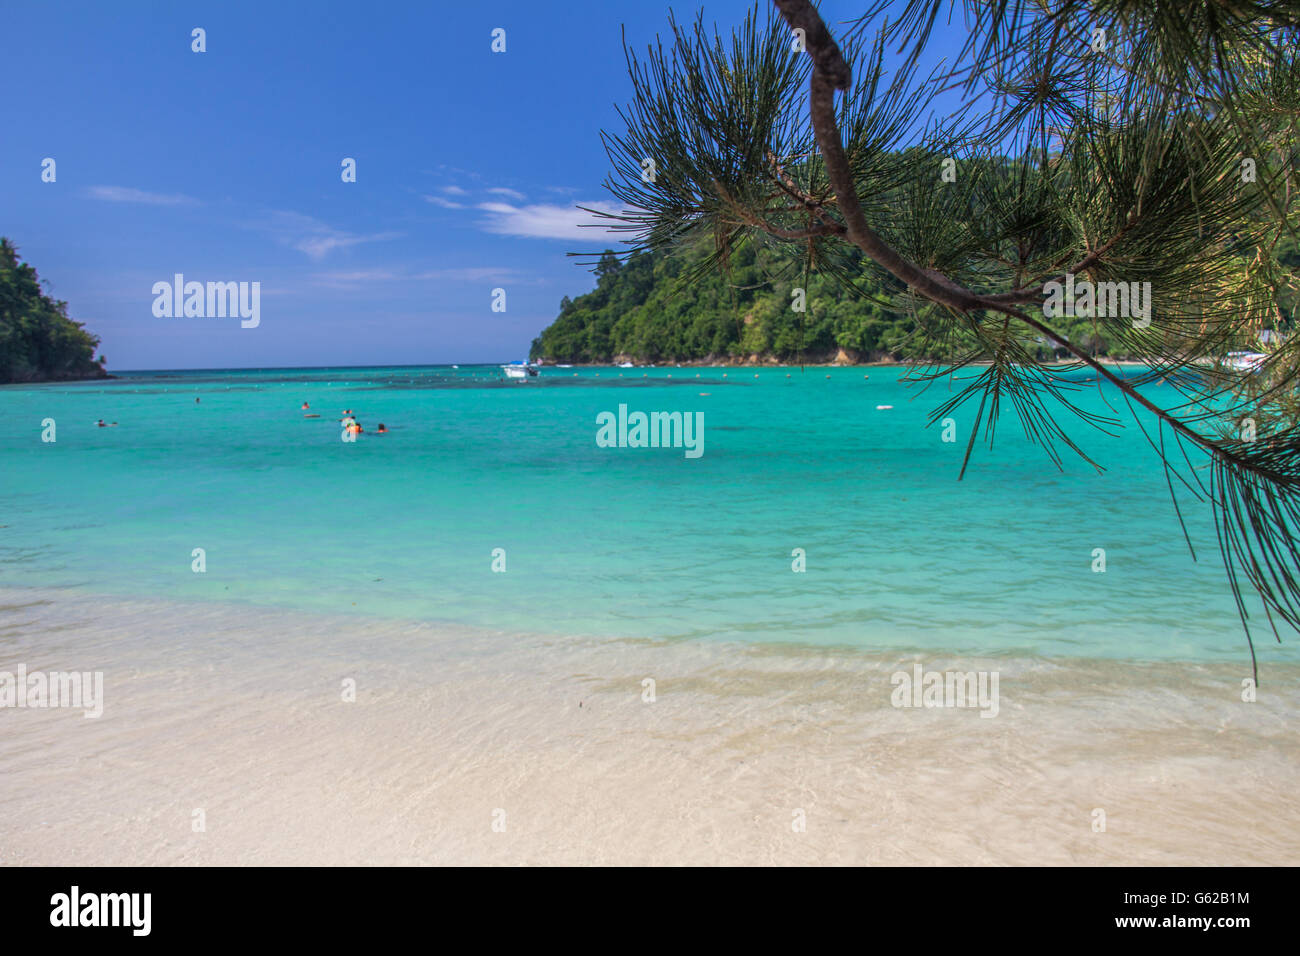 Sapi Island beach  in kota kinabalu malaysia - Stock Image